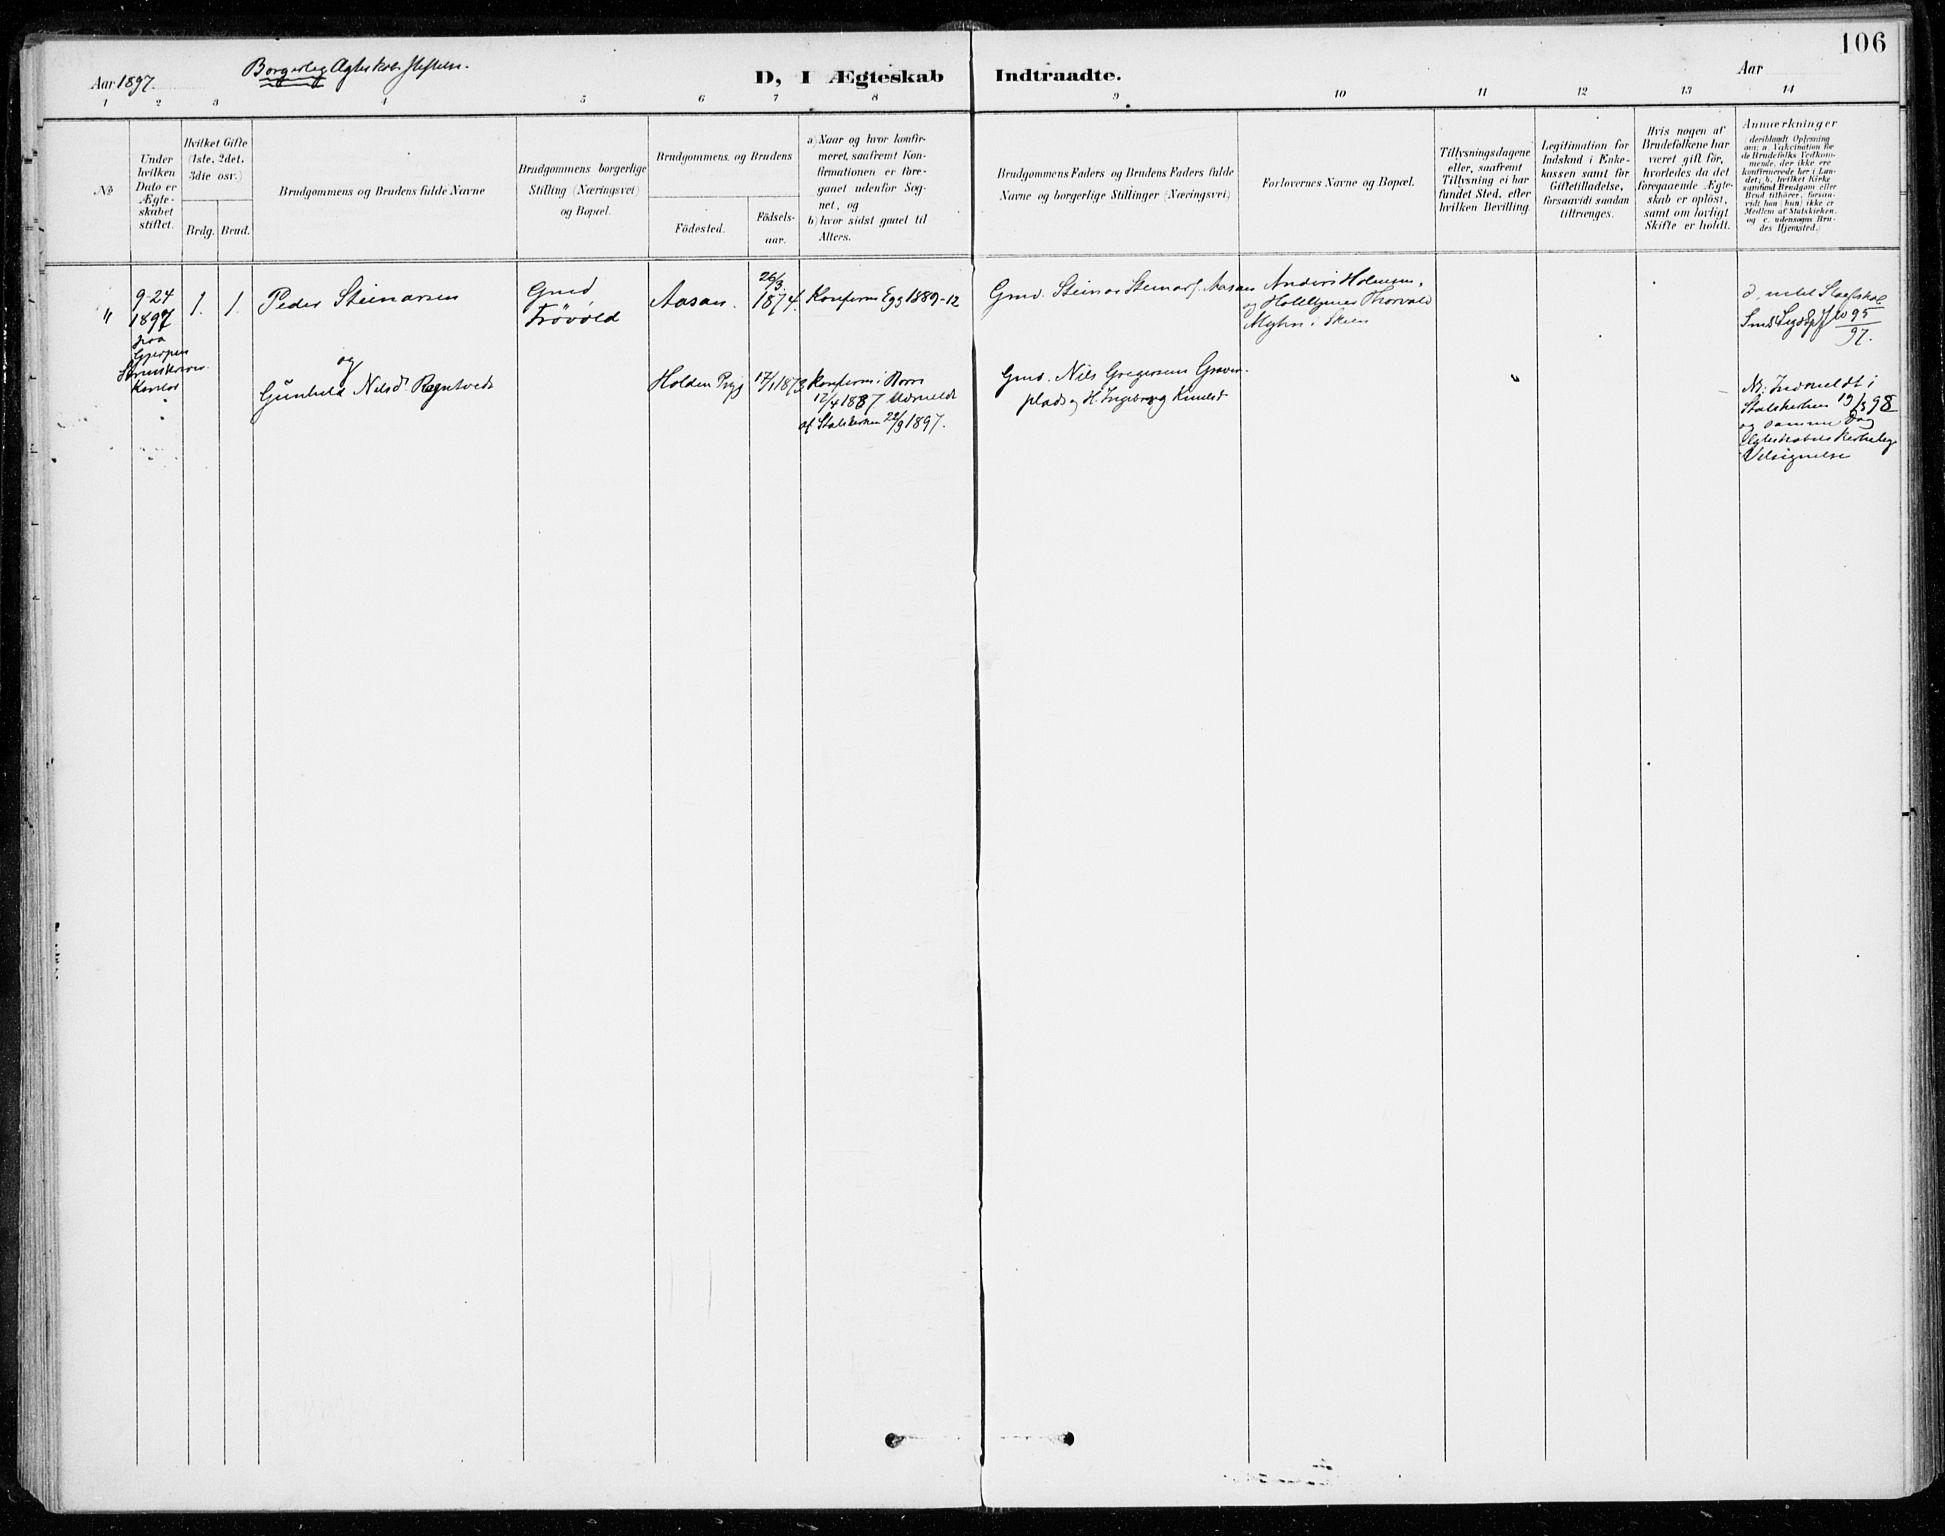 SAKO, Sigdal kirkebøker, F/Fc/L0002: Ministerialbok nr. III 2, 1894-1911, s. 106